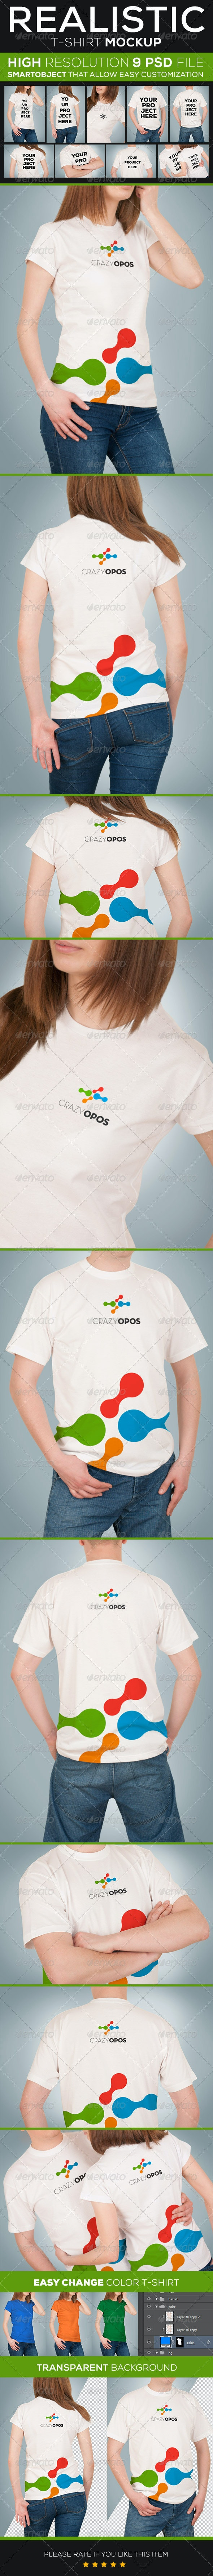 T-shirt Mockup - Product Mock-Ups Graphics